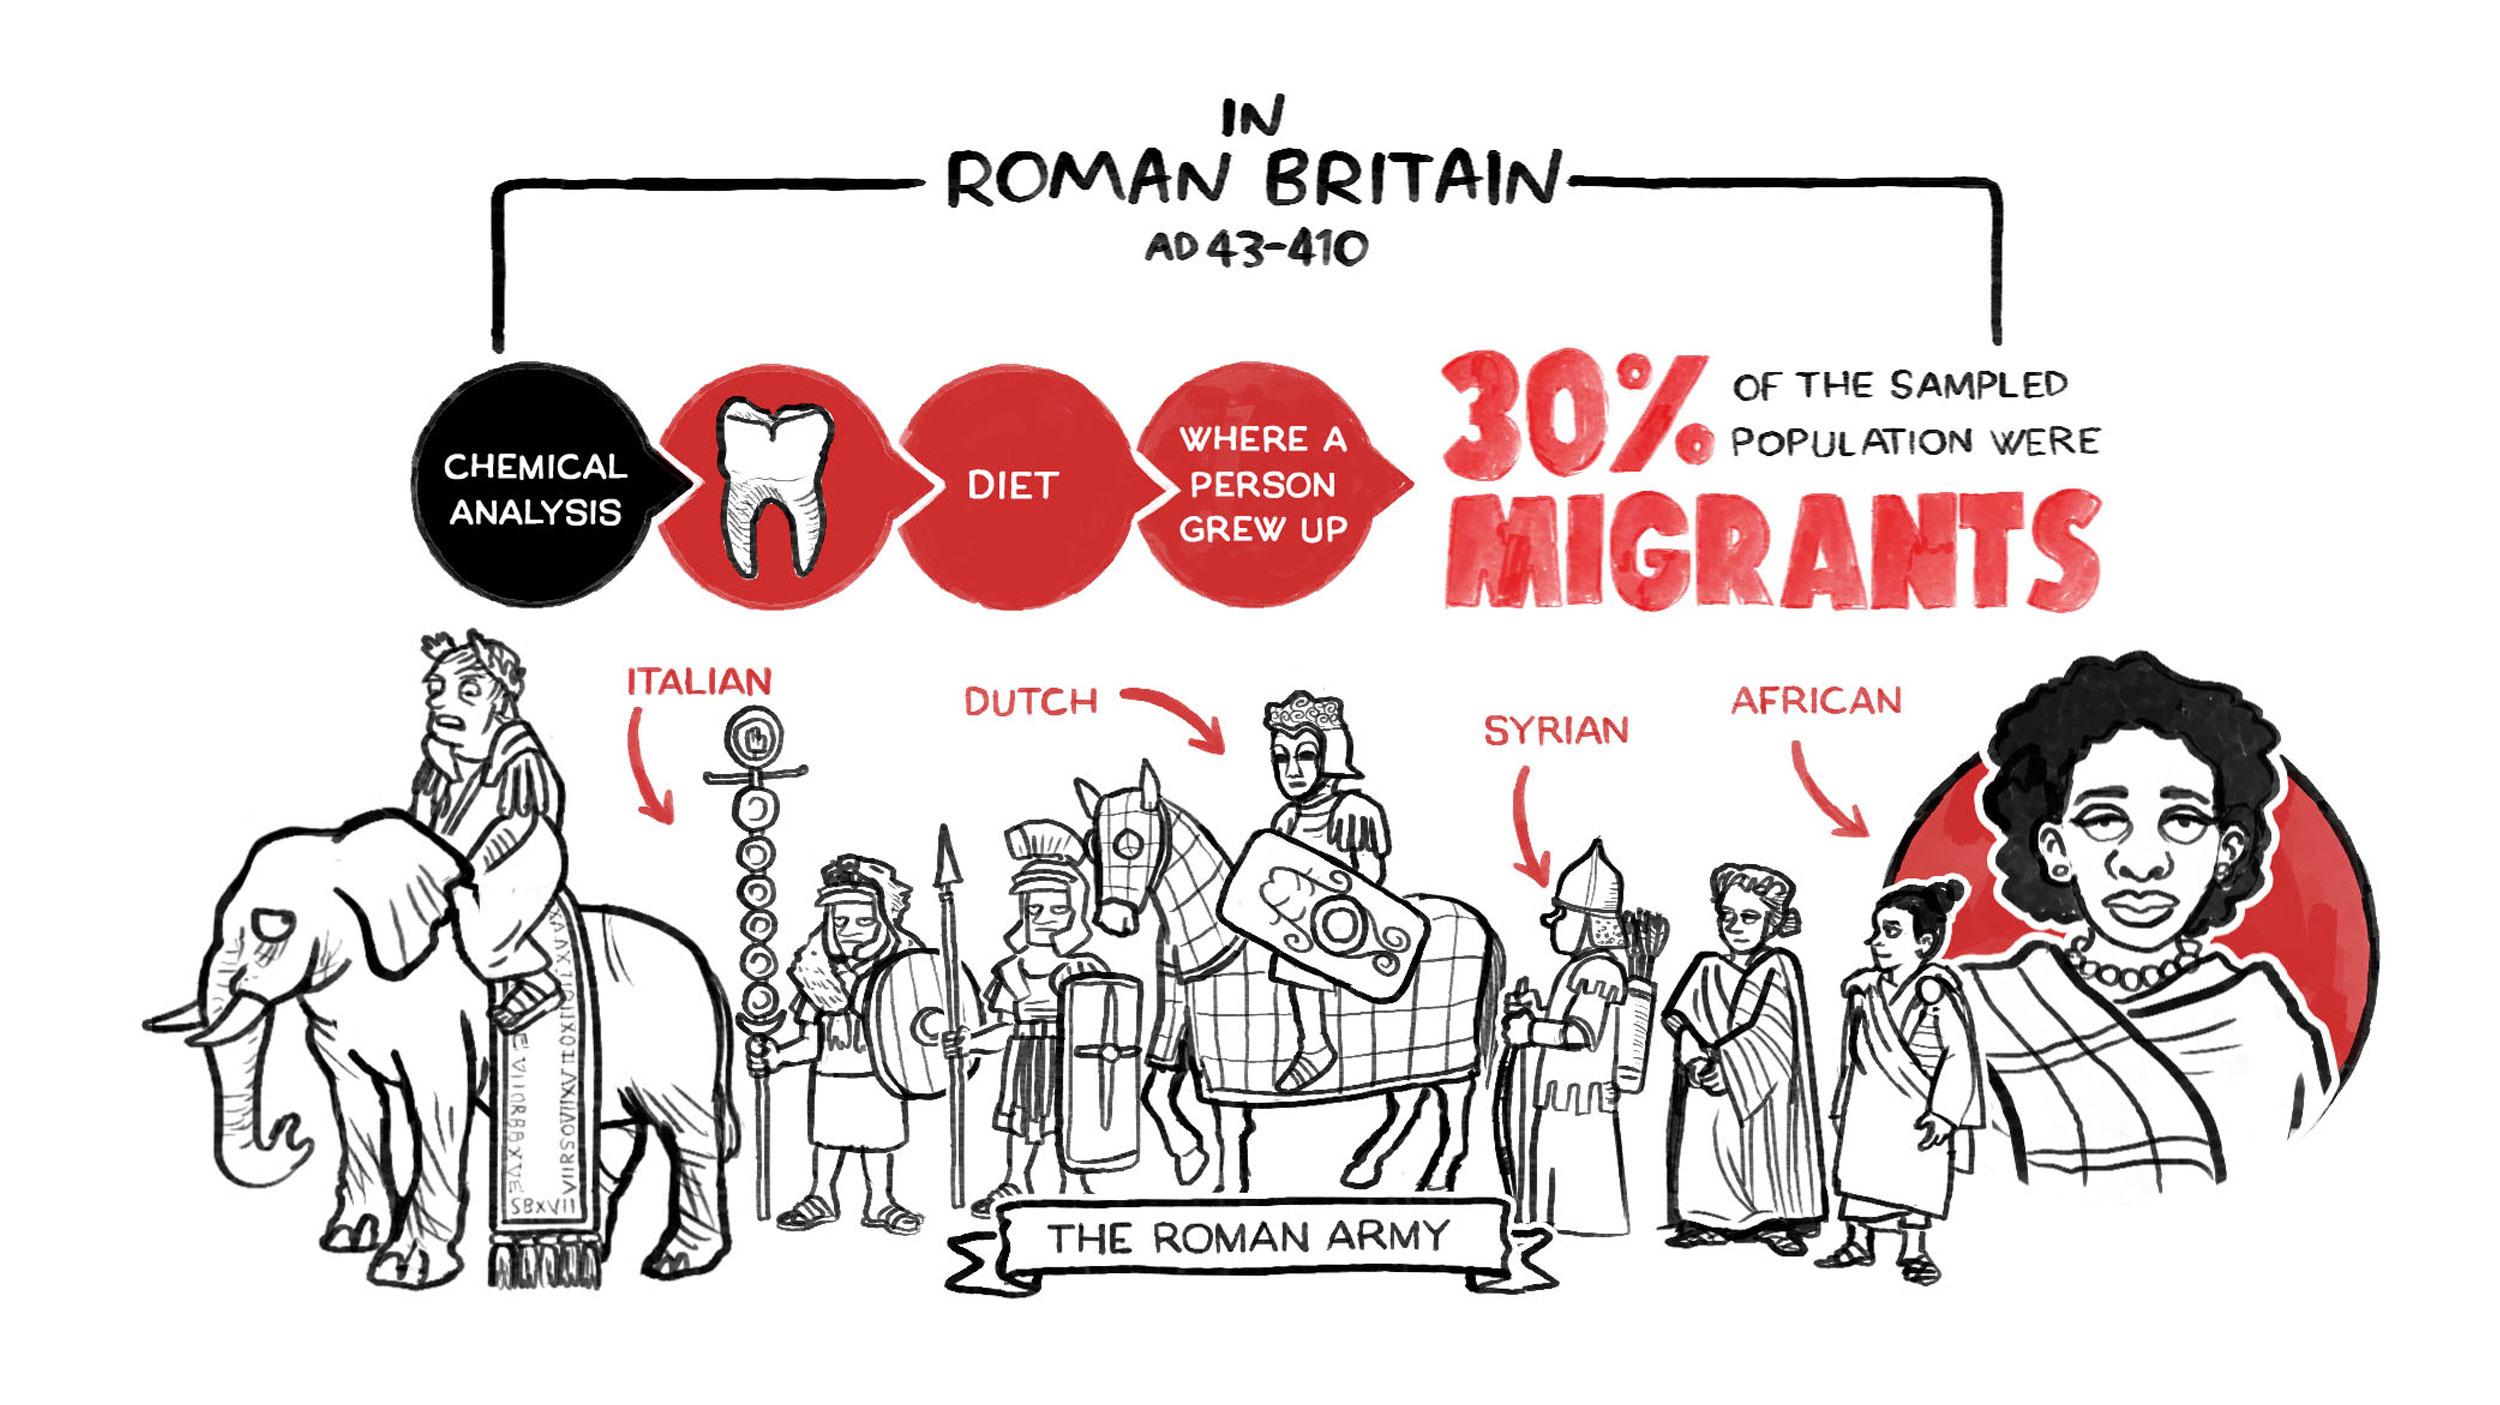 univeristy-of-kent-and-reading-migration-cognitive-06.jpg